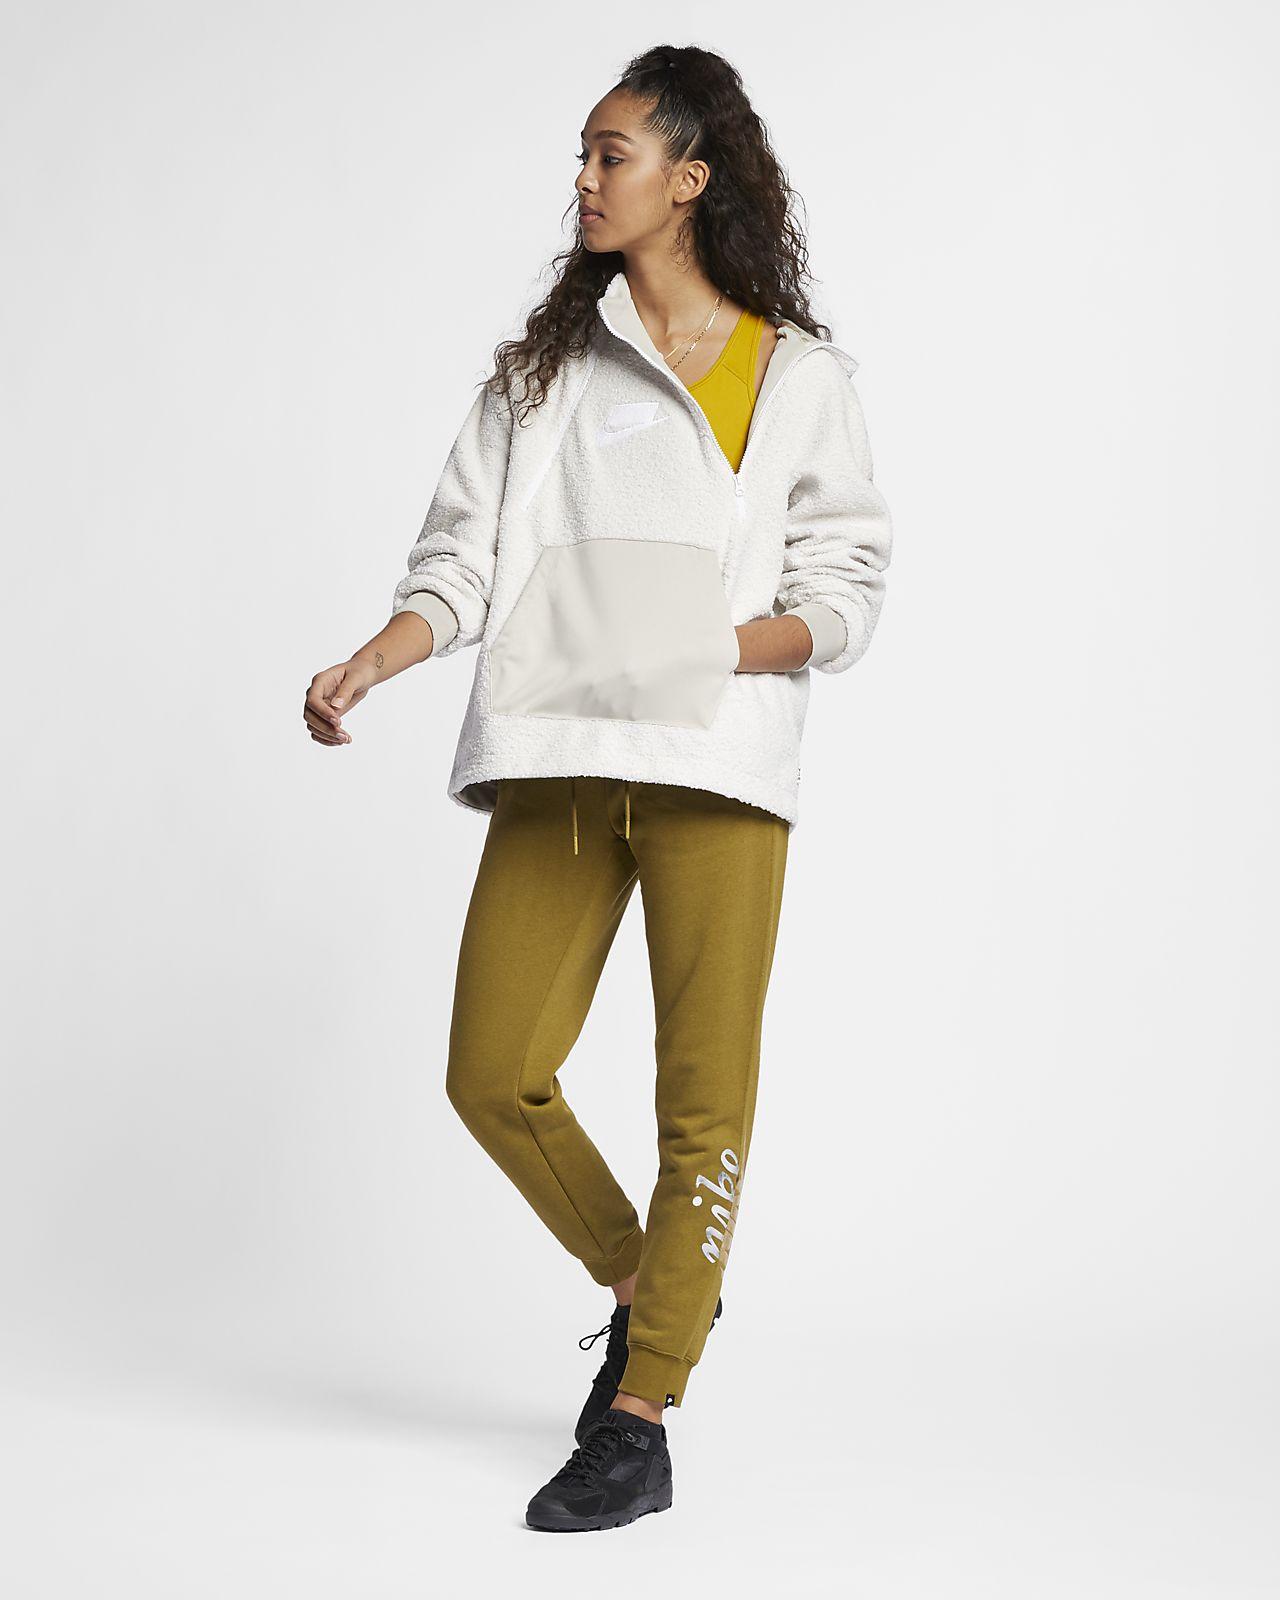 Damen Sportswear Nike NSW für Sherpa Hoodie eWEDH9IY2